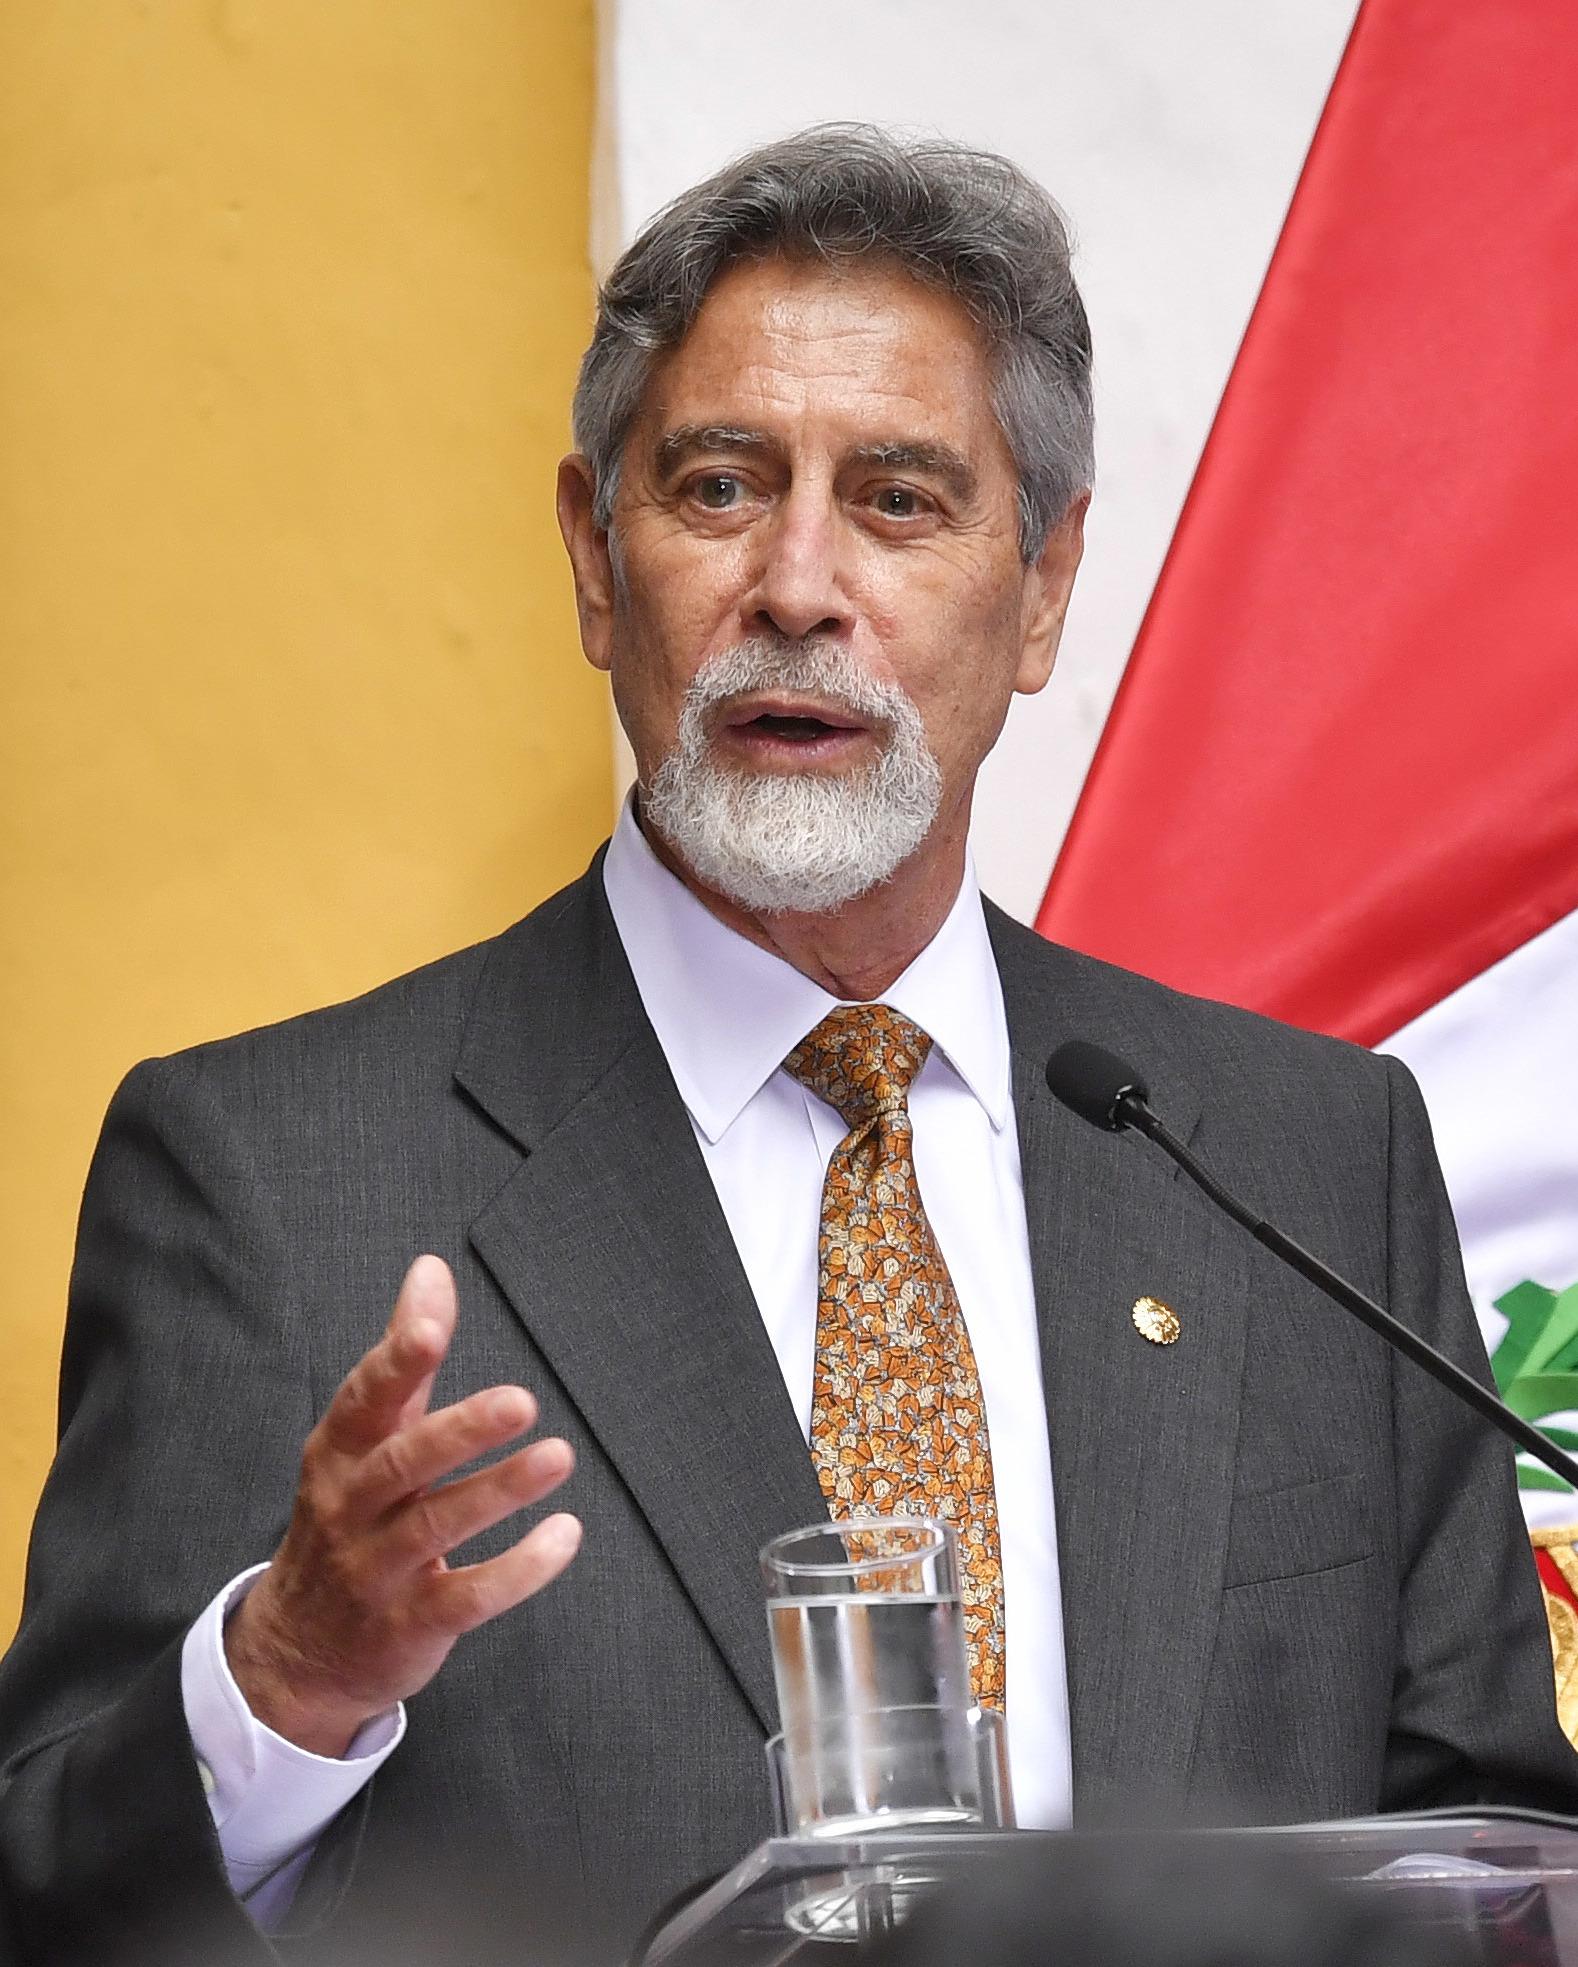 Presidente de Perú Francisco Sagasti